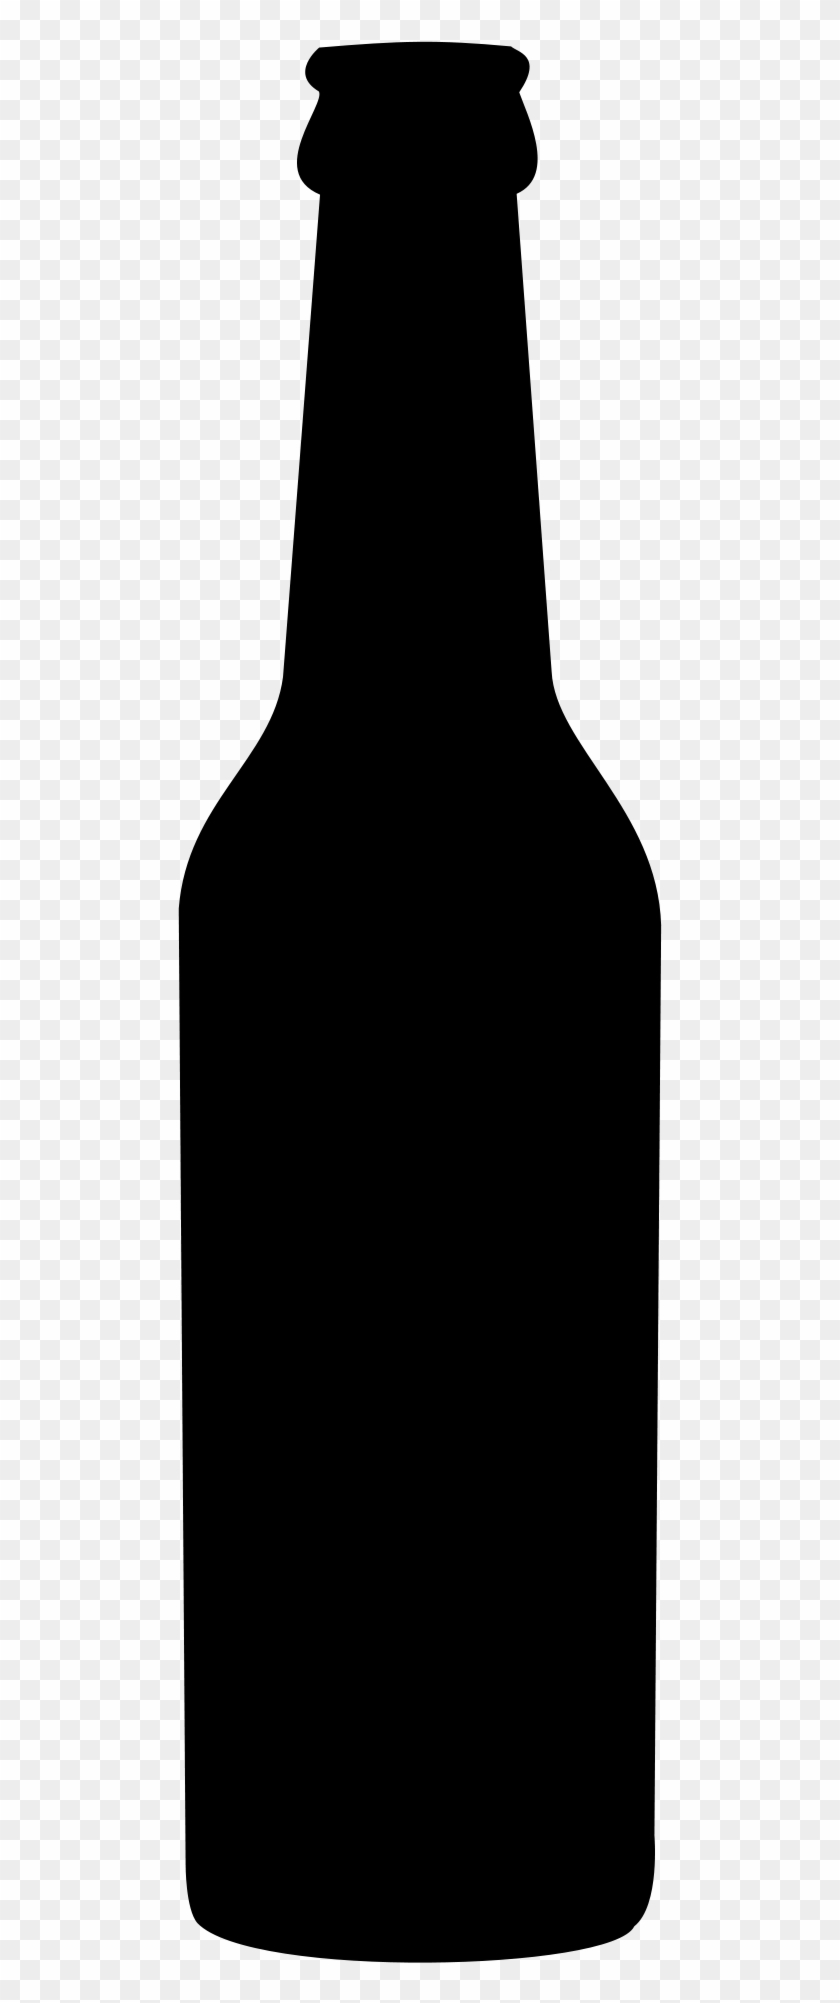 Download - Glass Bottle #96605